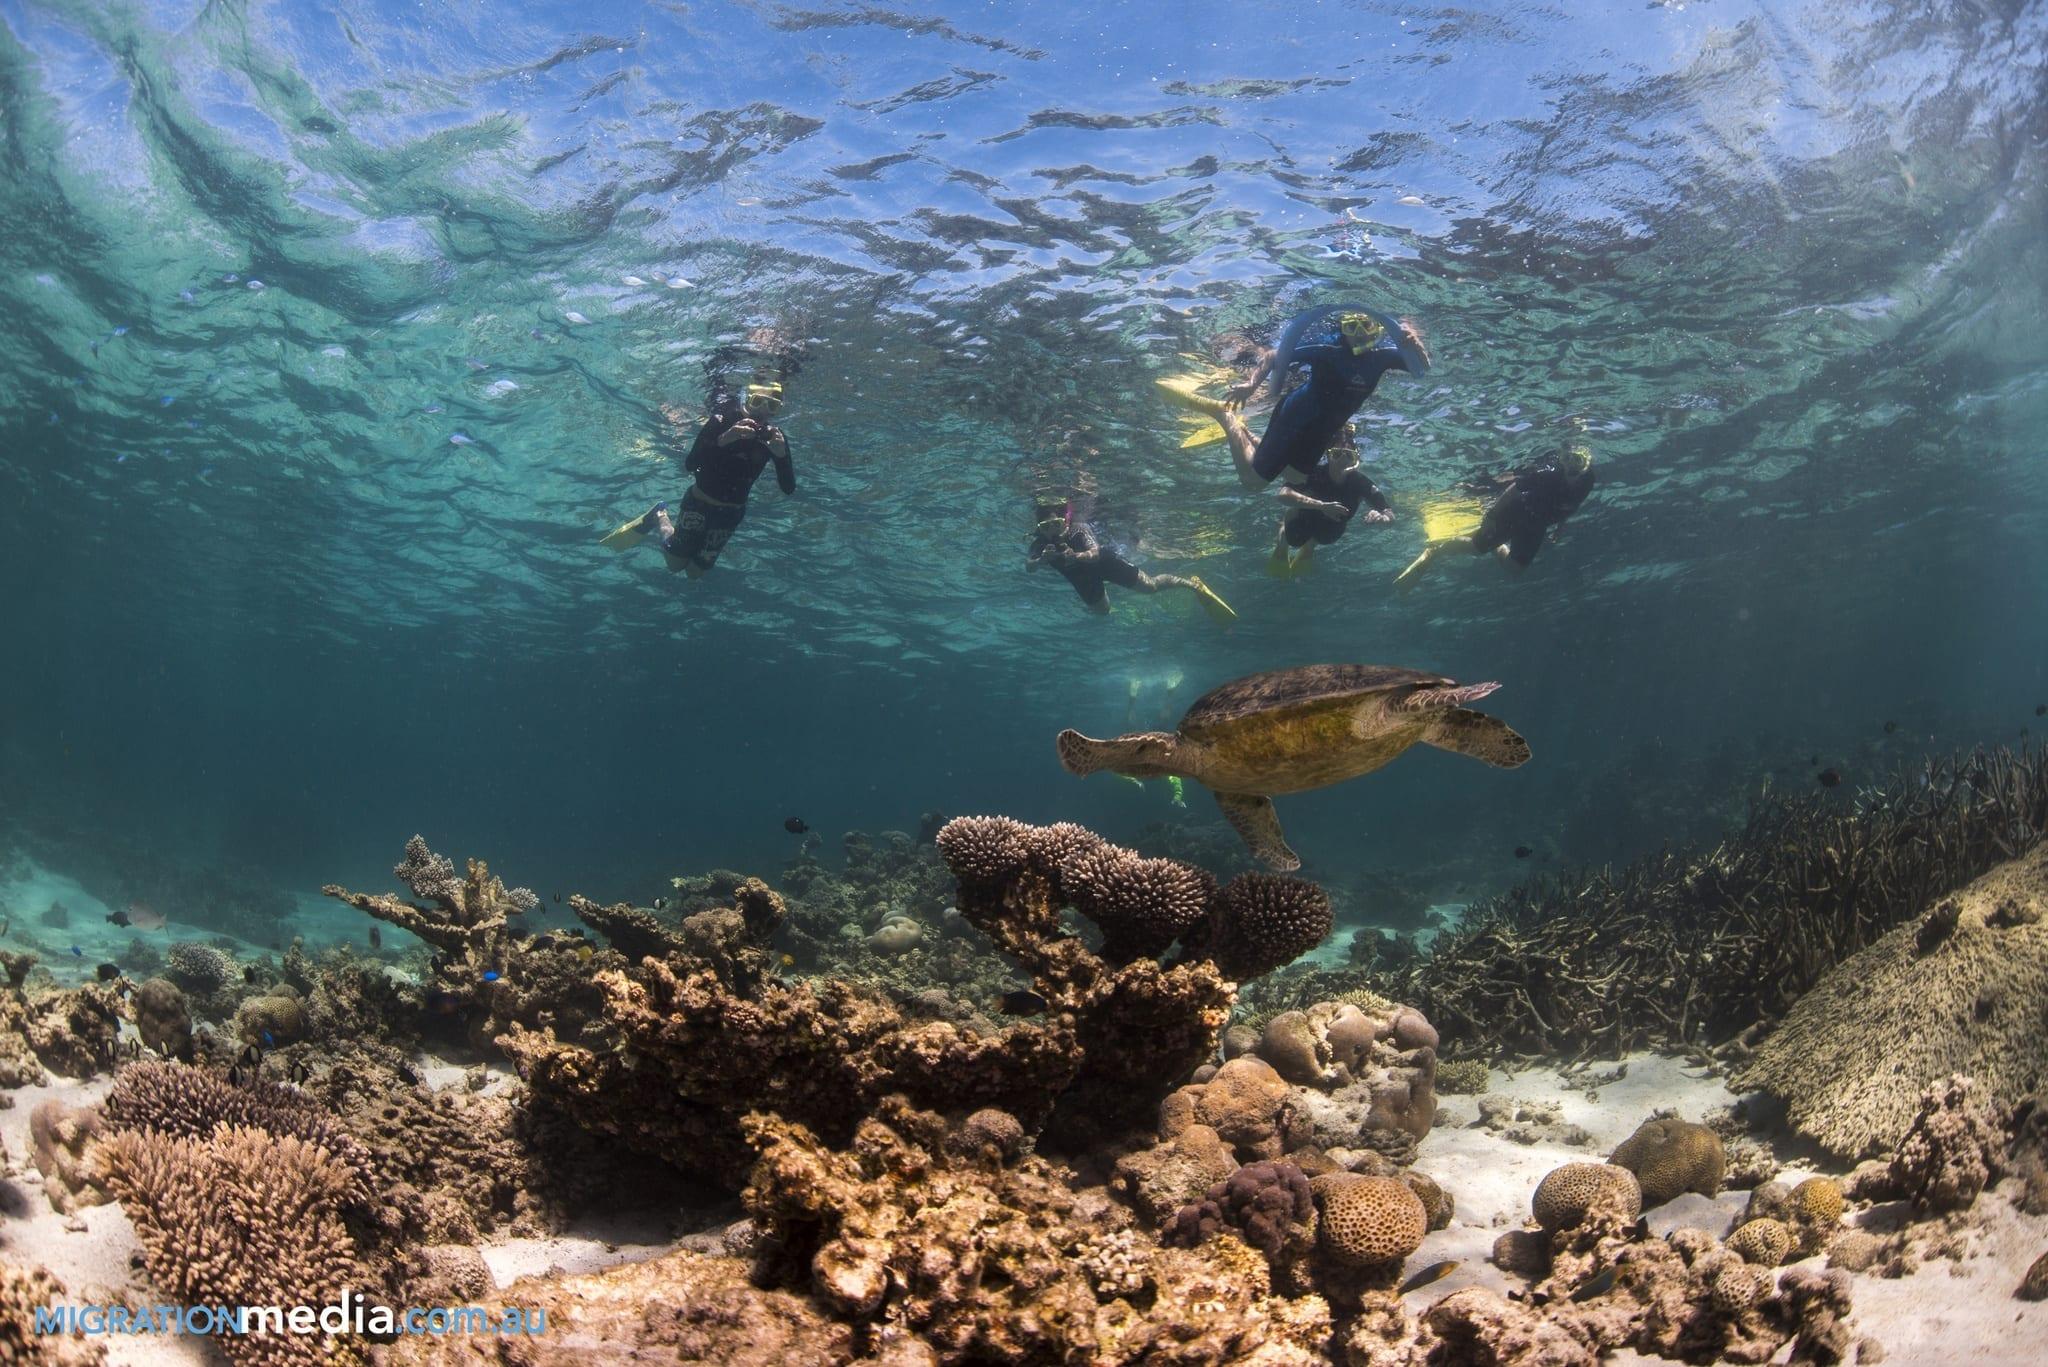 Turtle at Ningaloo Reef